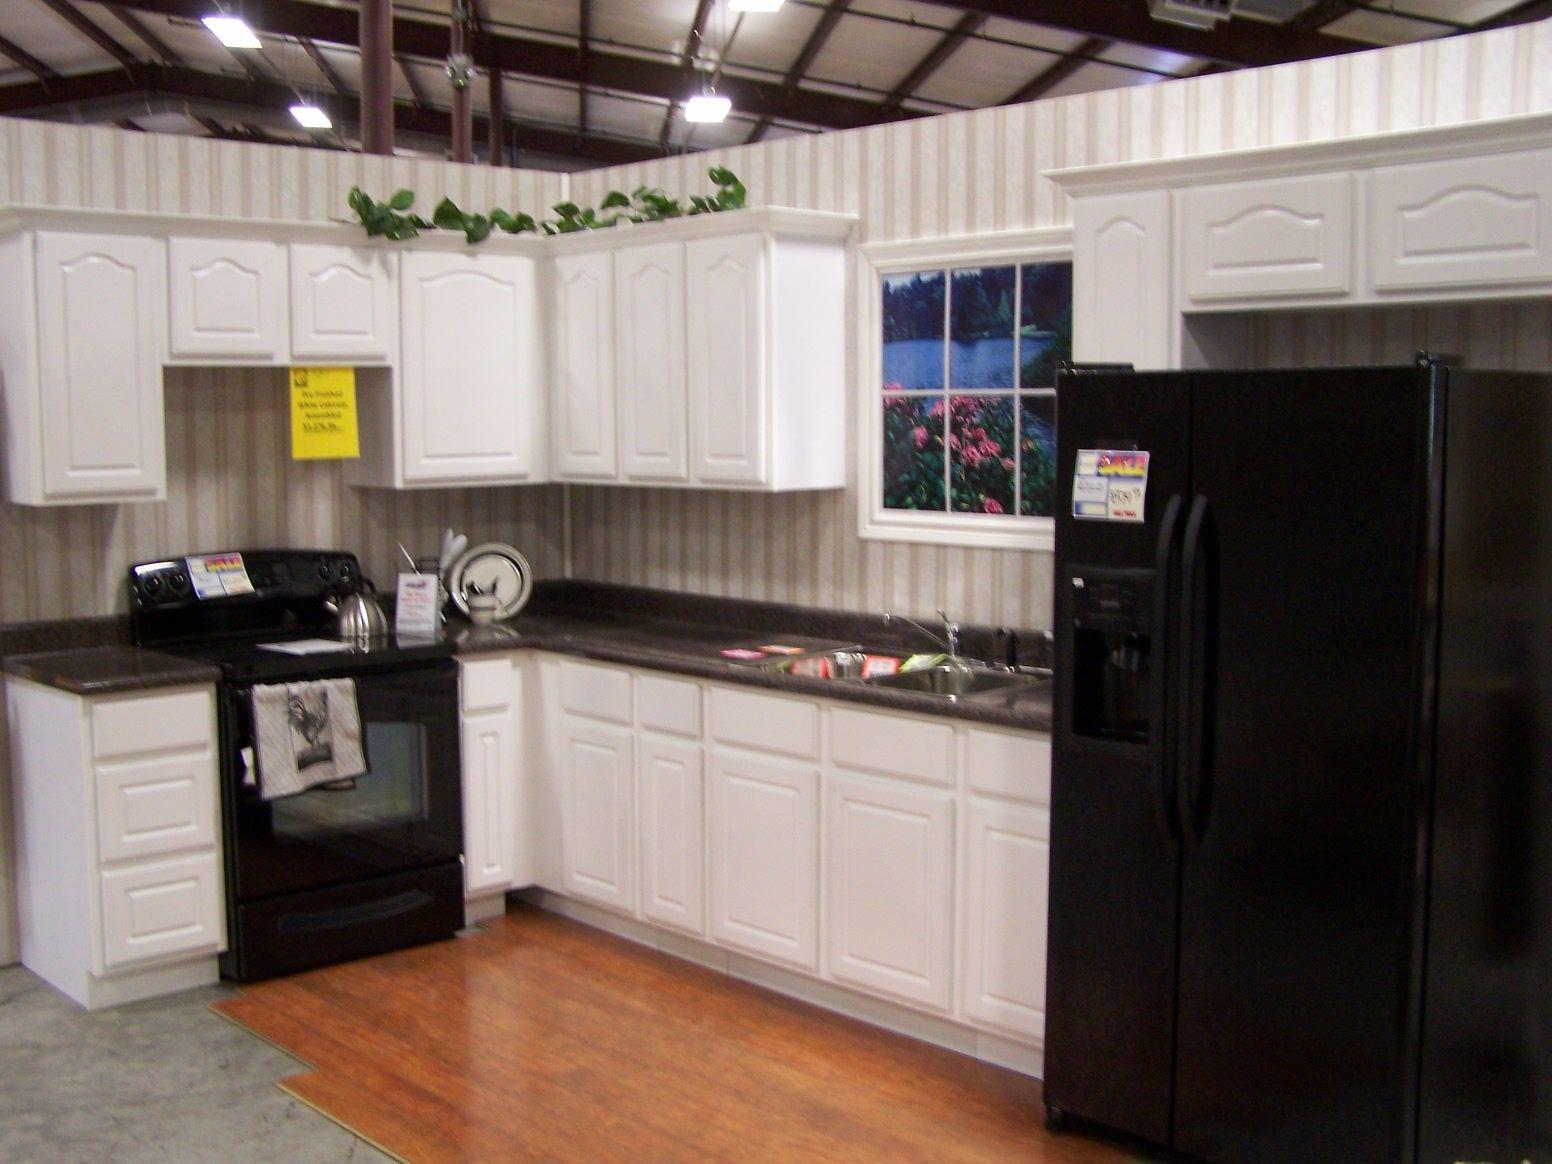 Black And White Kitchen Ideas Small Design Interior With Striped Backsplash Cabinets Also